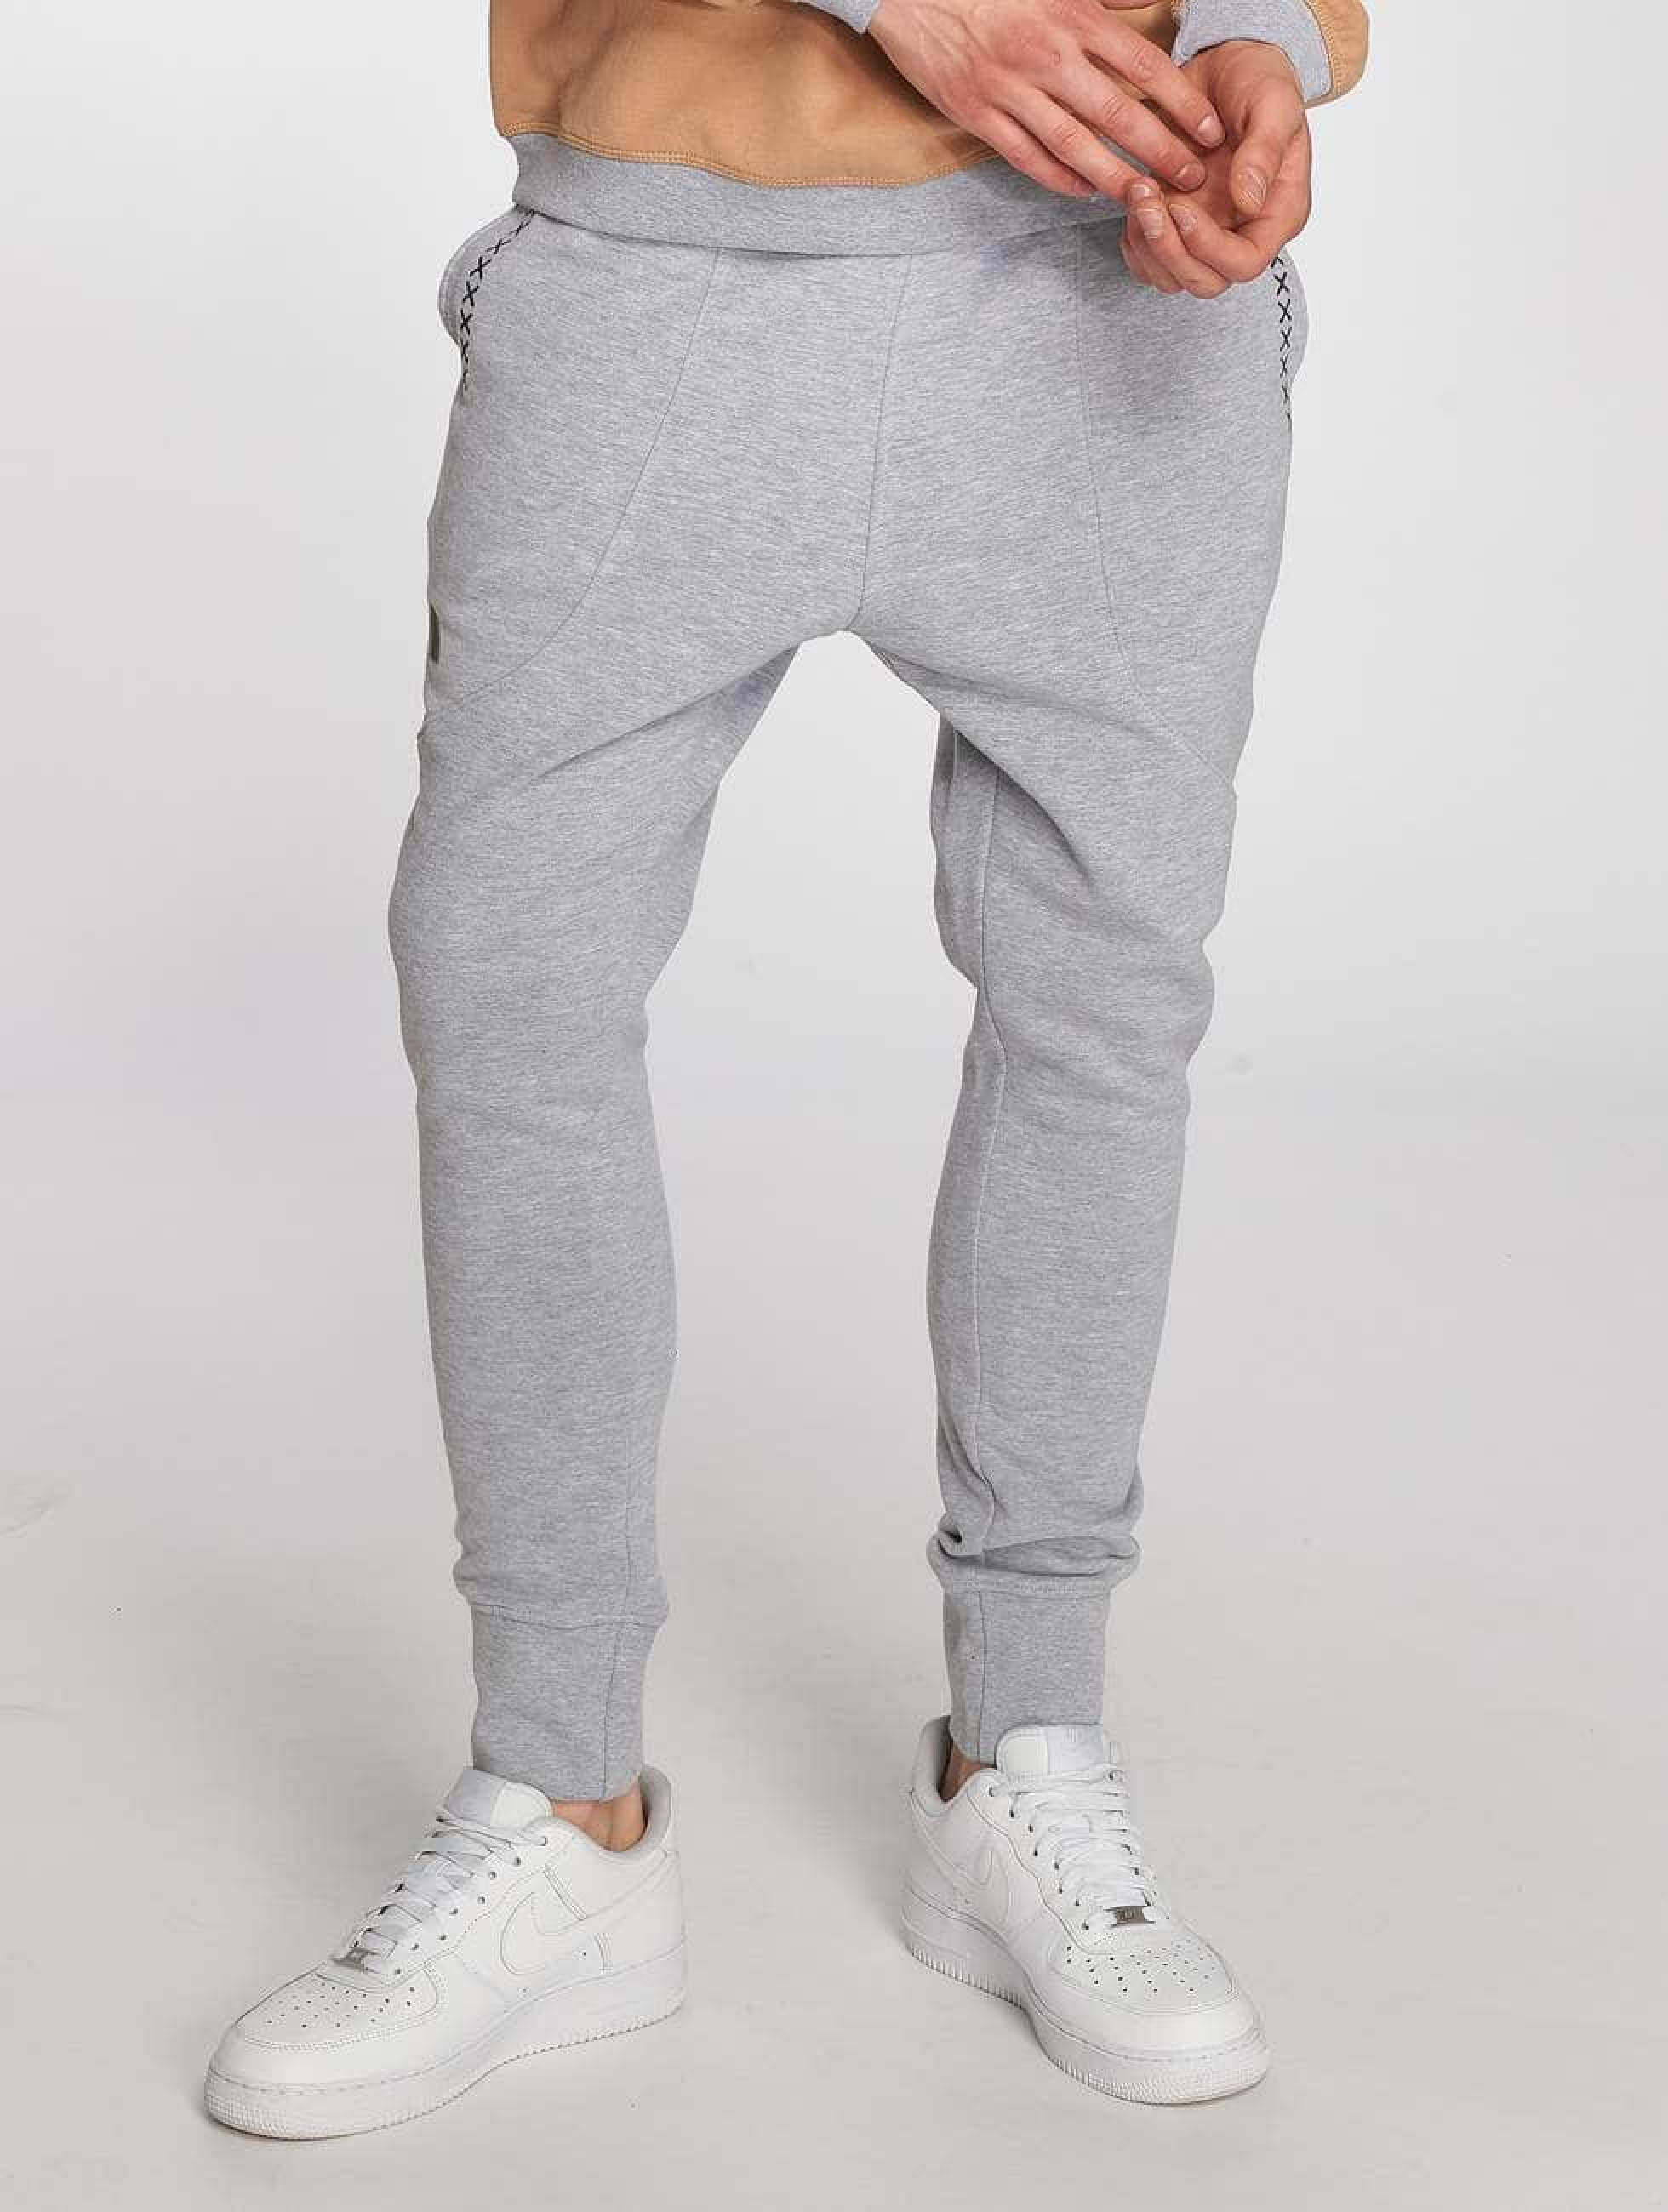 Just Rhyse / Sweat Pant Skagway in grey L